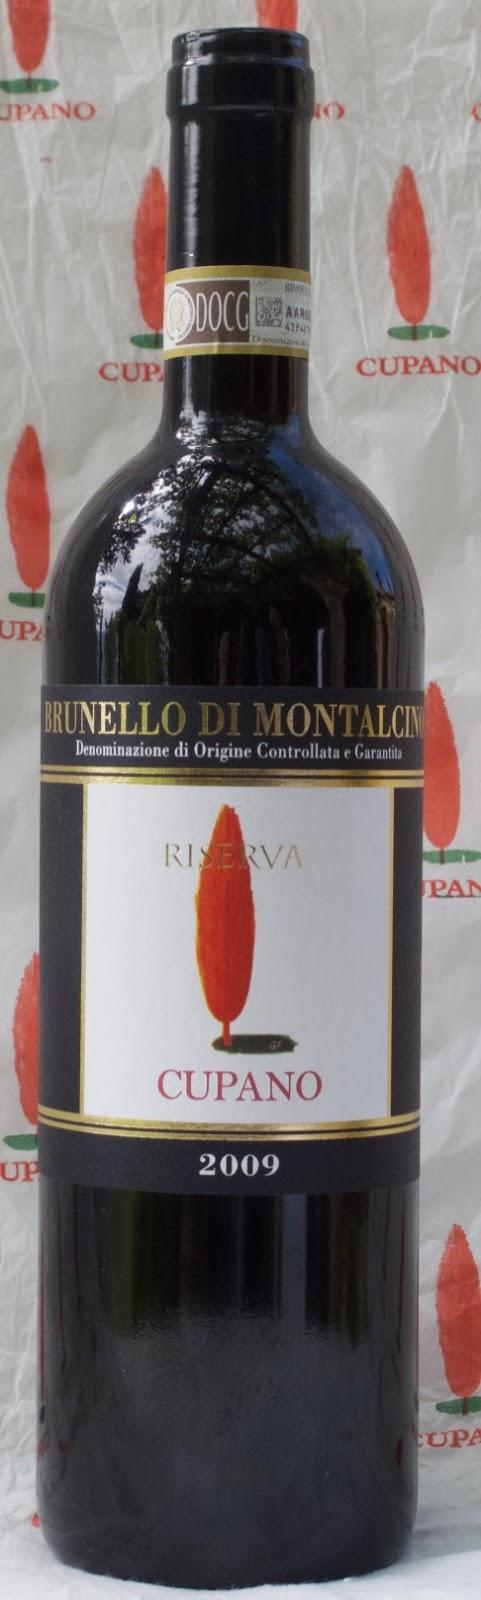 Cupano News Brunello Riserva 2009 Among The 25 Best Wines